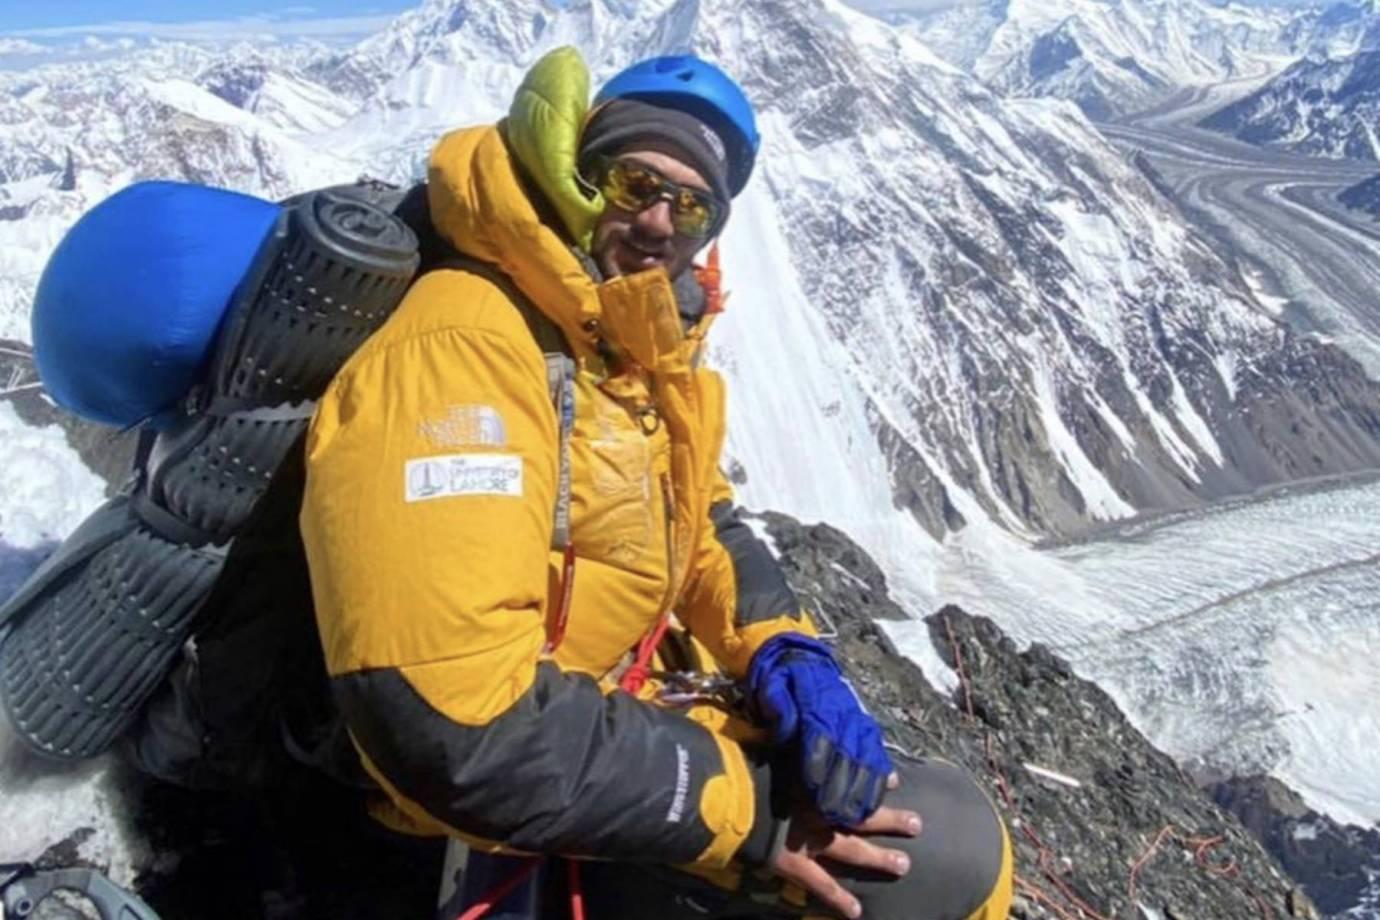 Shehroze Kashif 19-year-old Pakistani on summit of K2